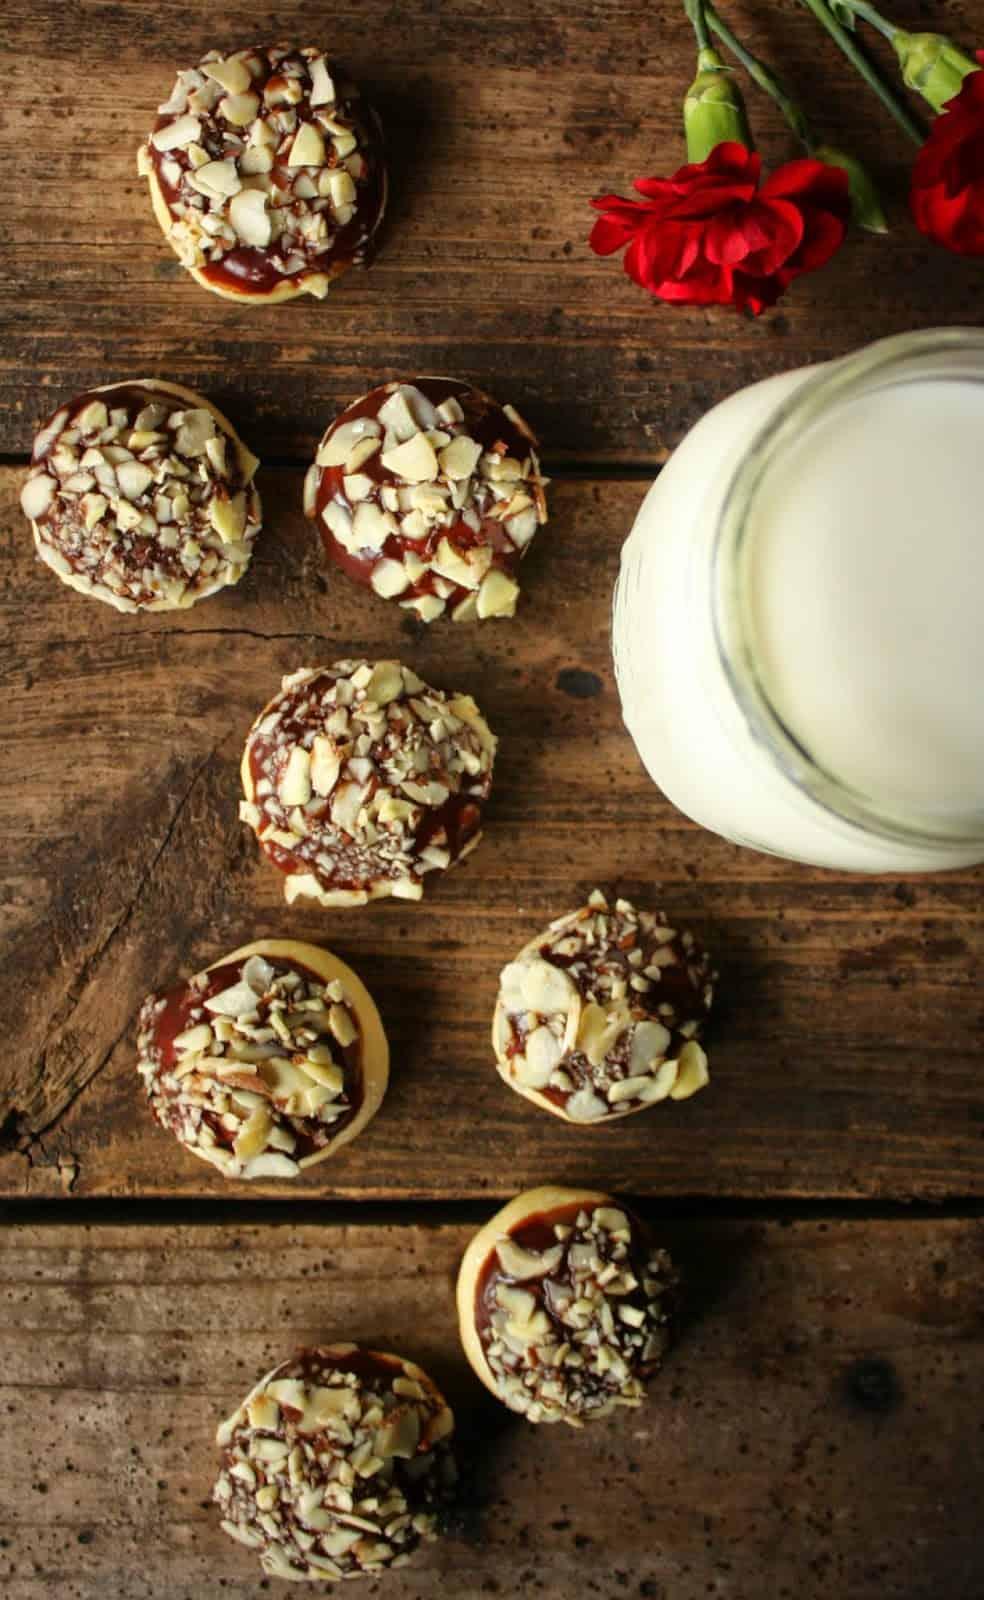 Cardamon Nutella Almond Crunch Cookies